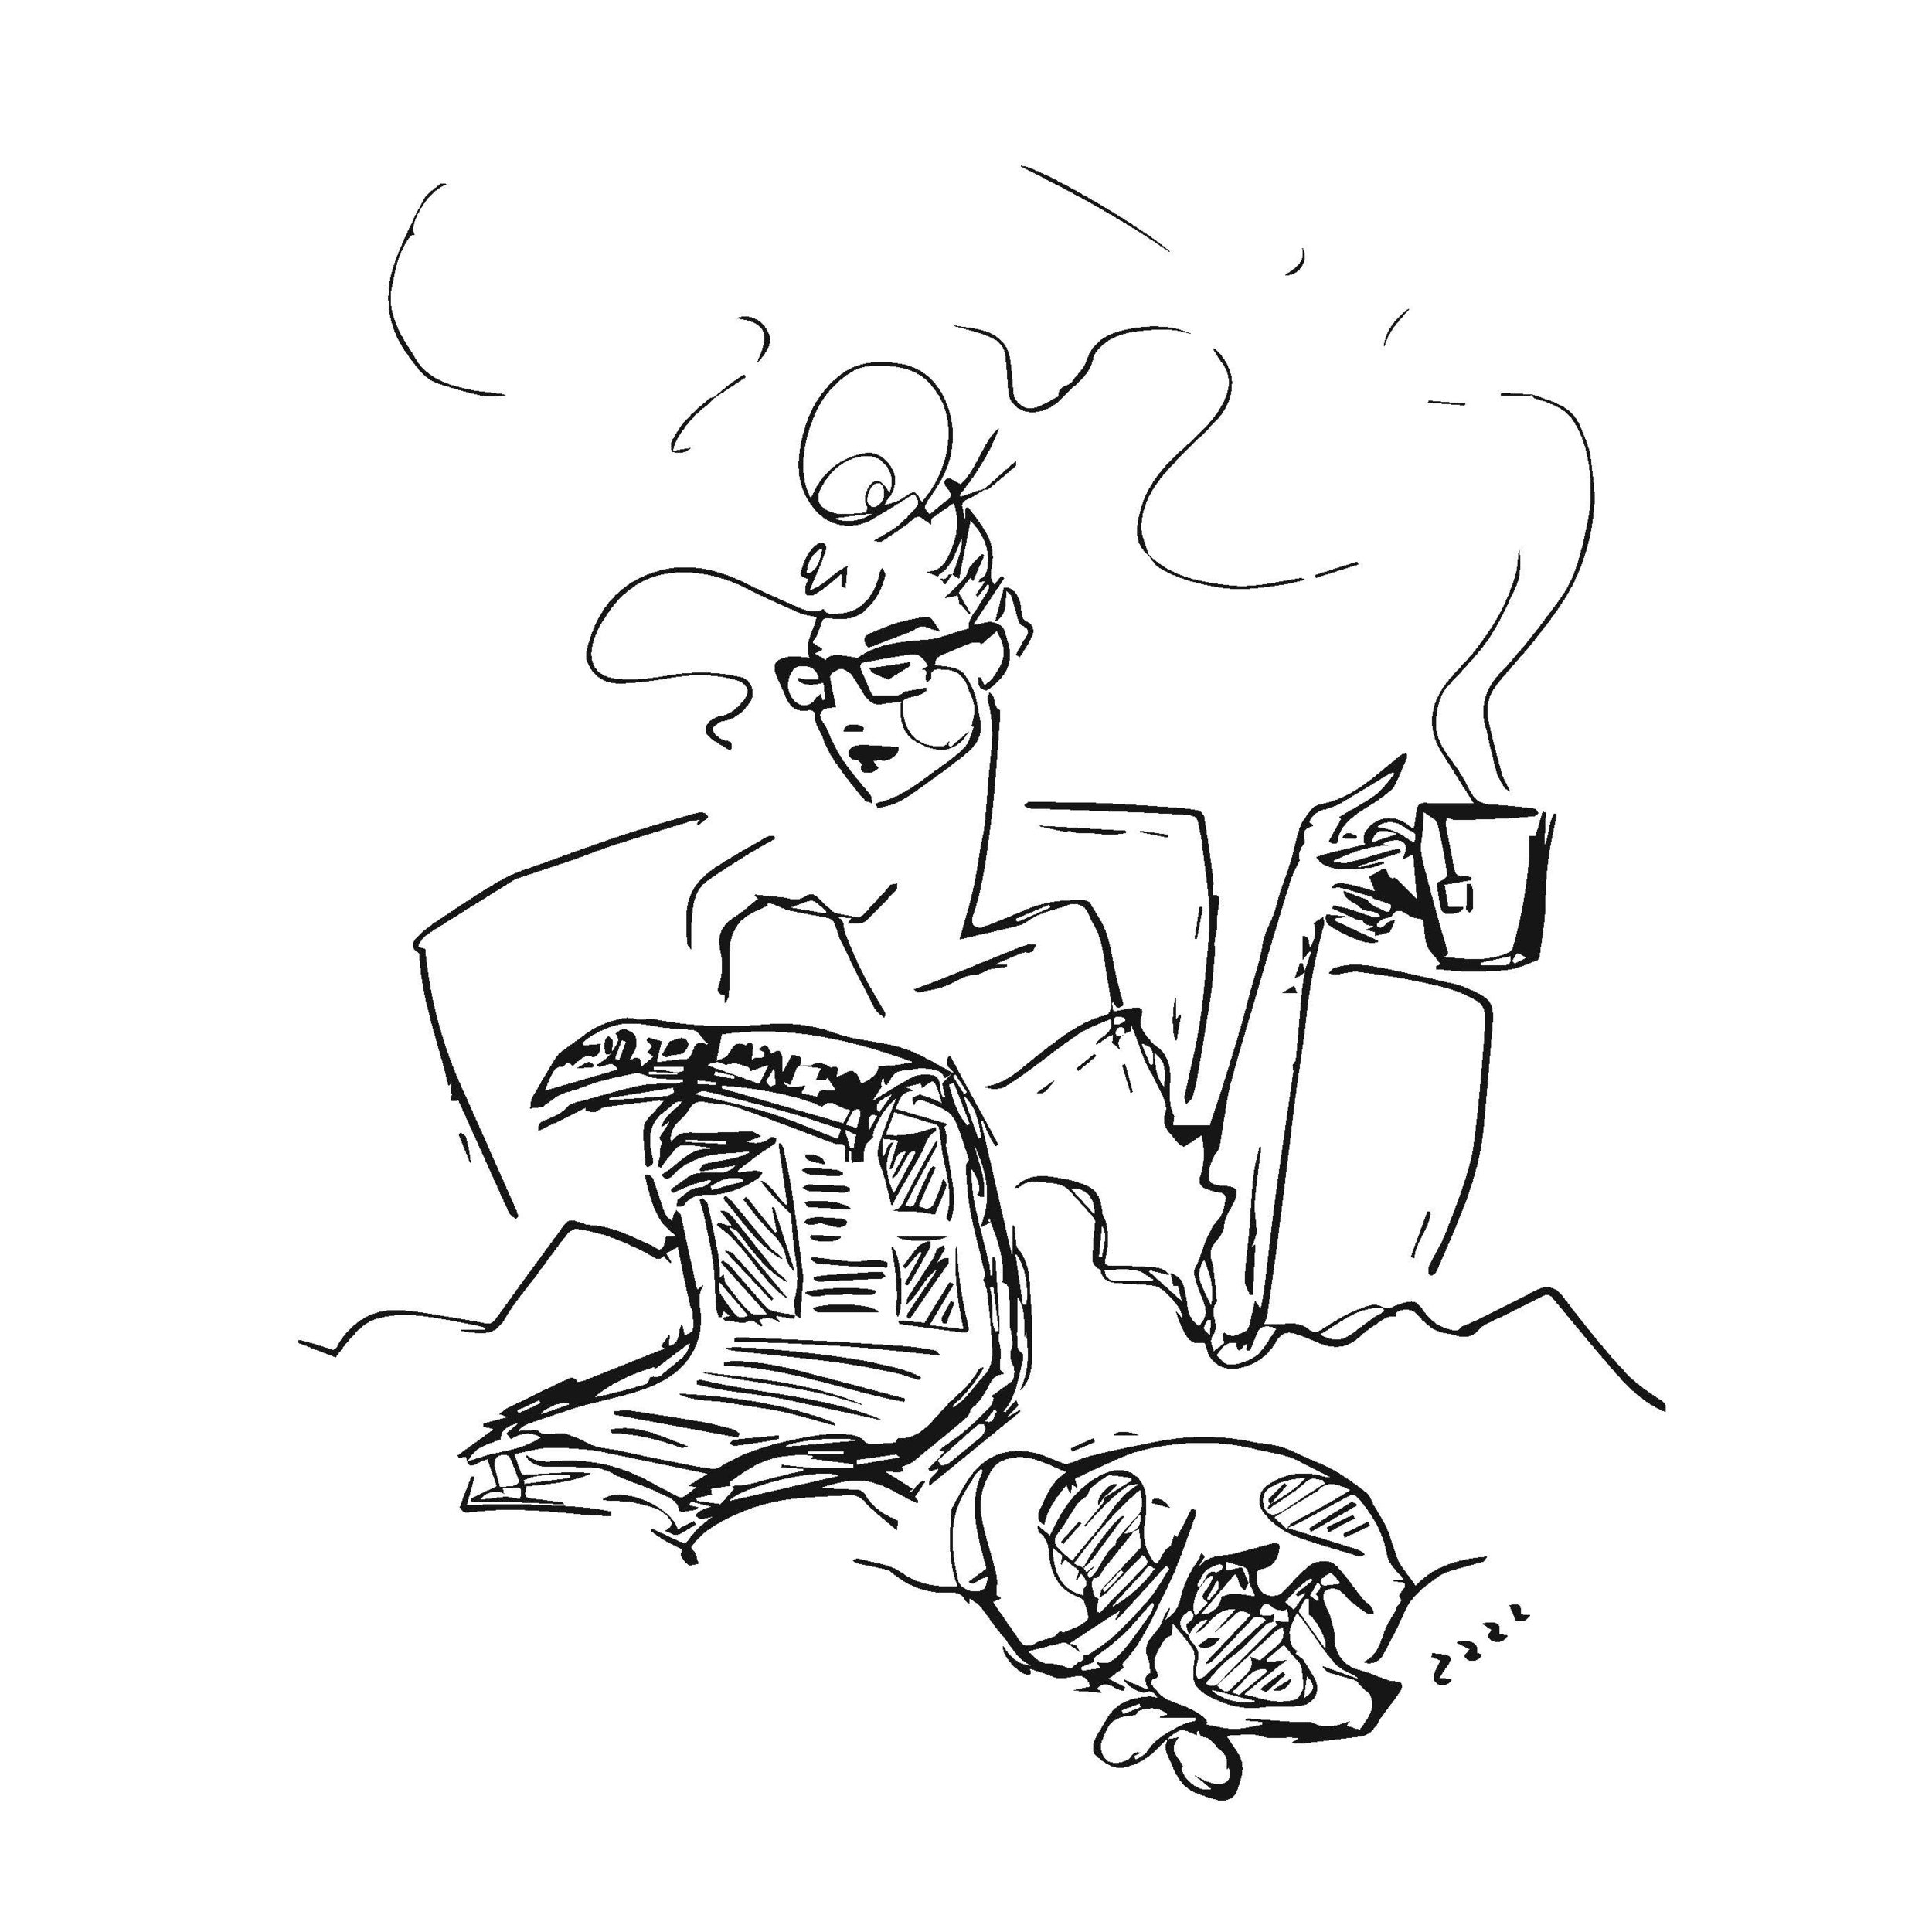 sunday-vibes-fashion-illustration-spotted-kettle-studio.jpg